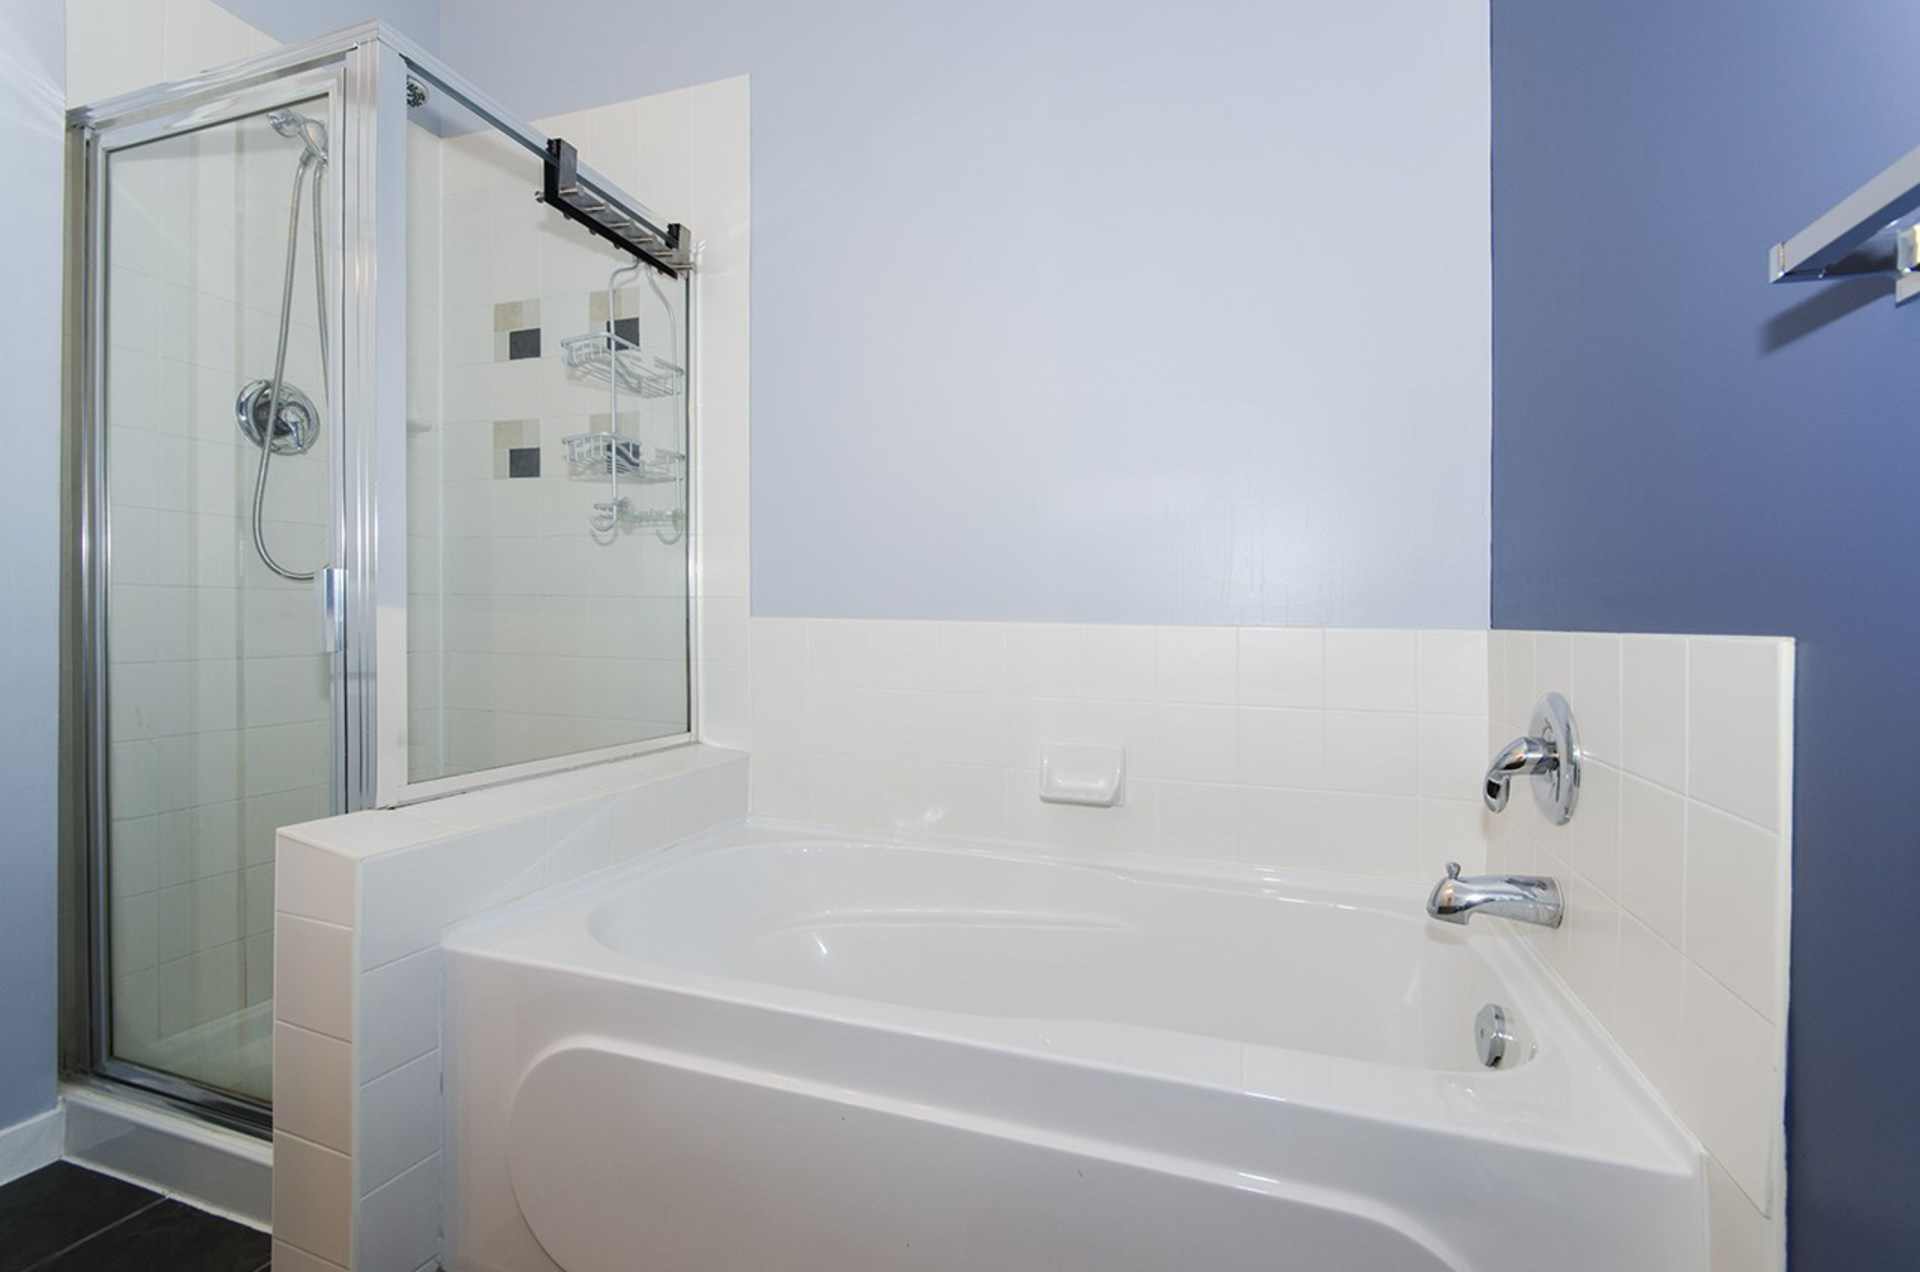 6508-denbigh-avenue-forest-glen-bs-burnaby-south-13 at 318 - 6508 Denbigh Avenue, Forest Glen BS, Burnaby South